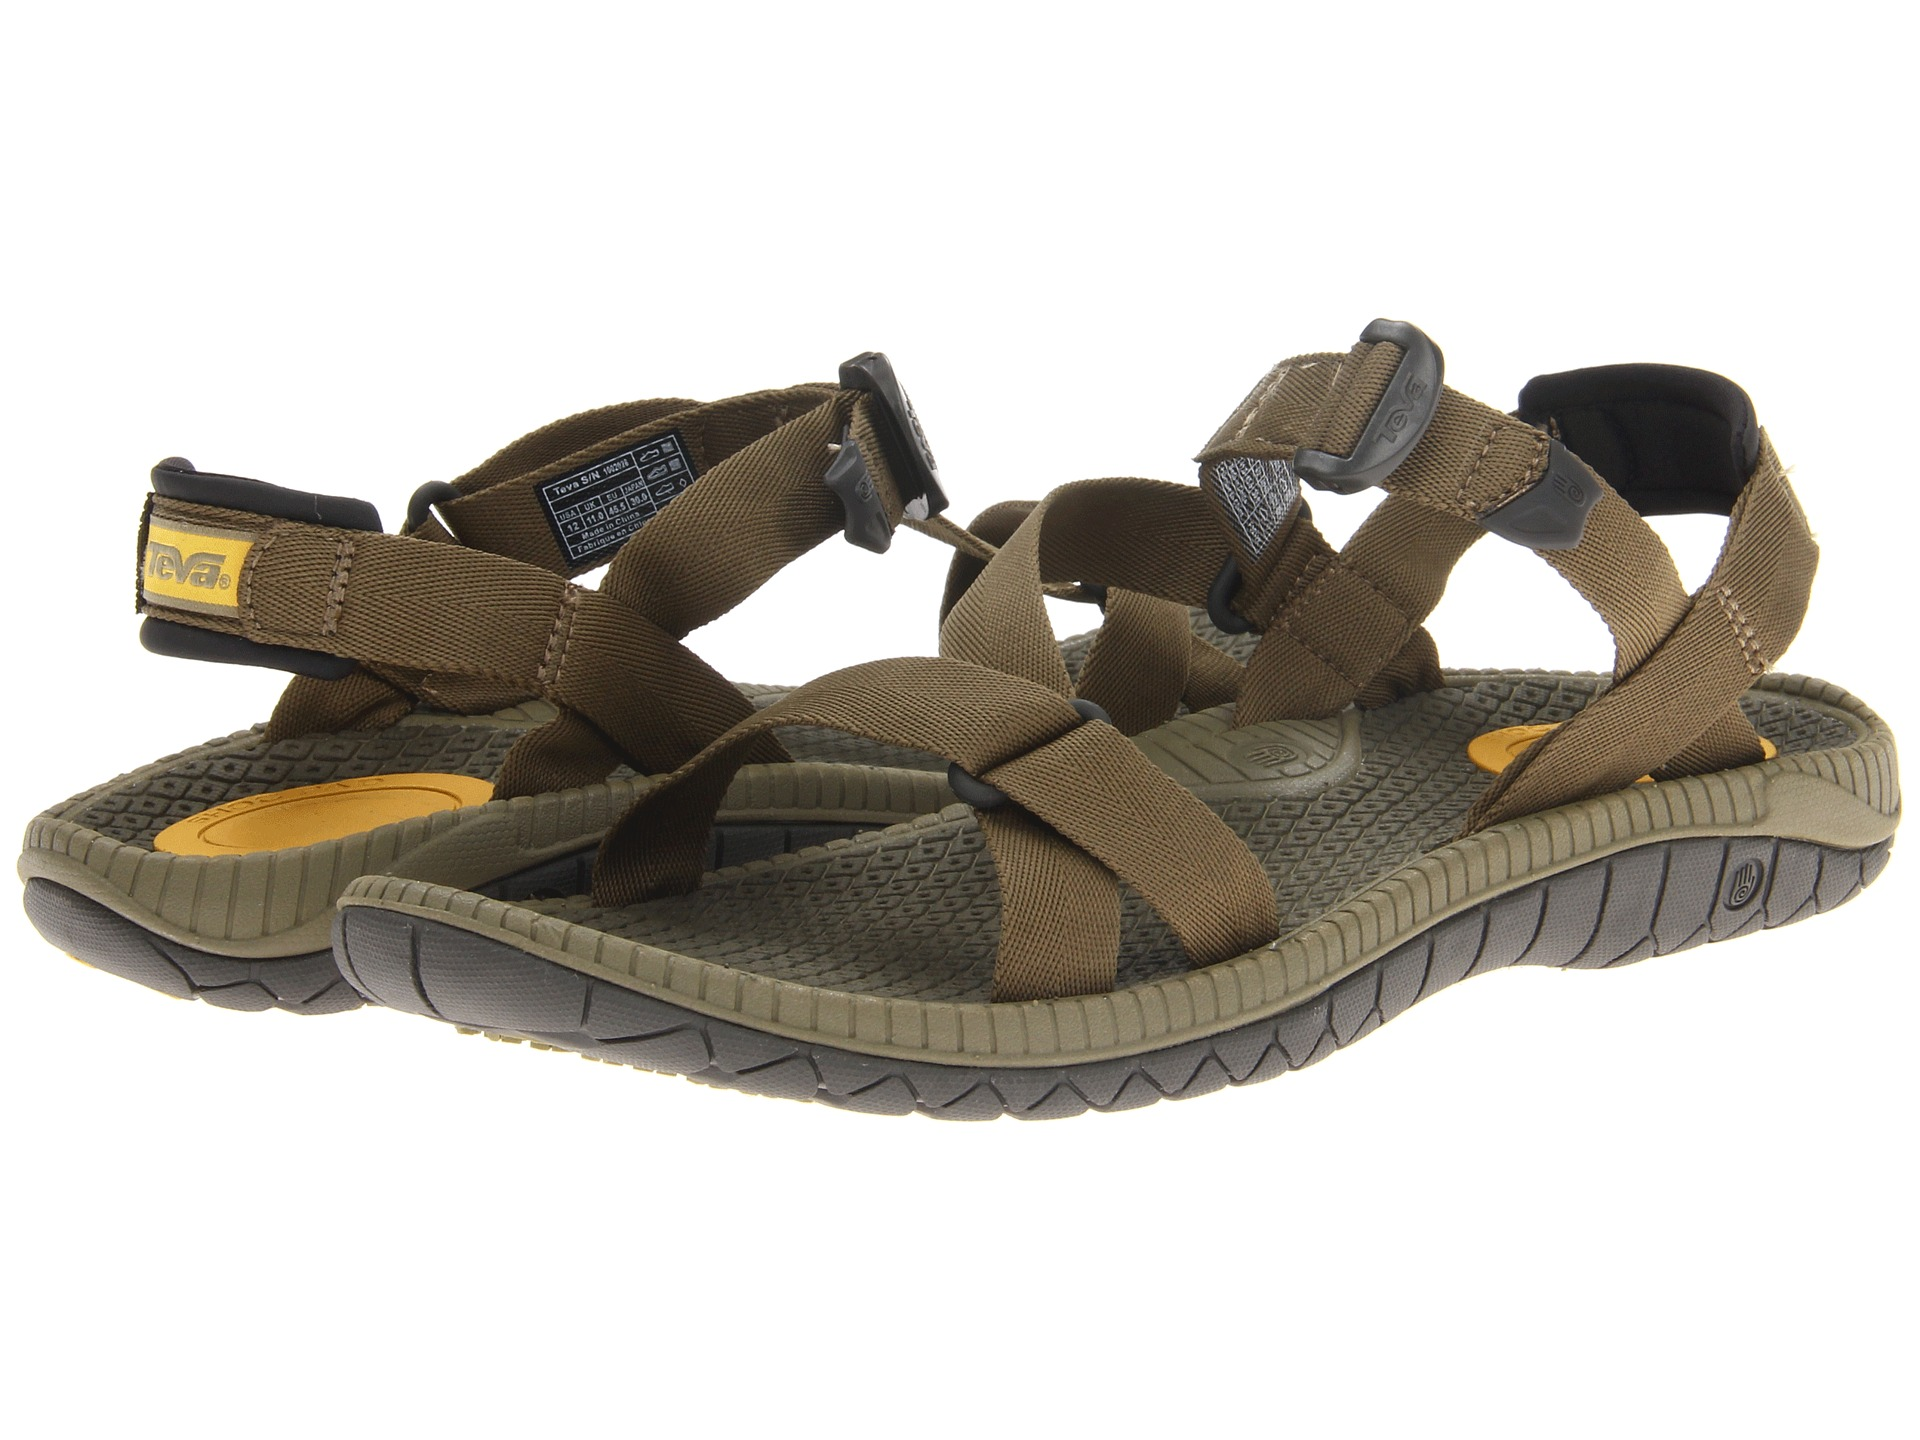 Where to buy teva sandals